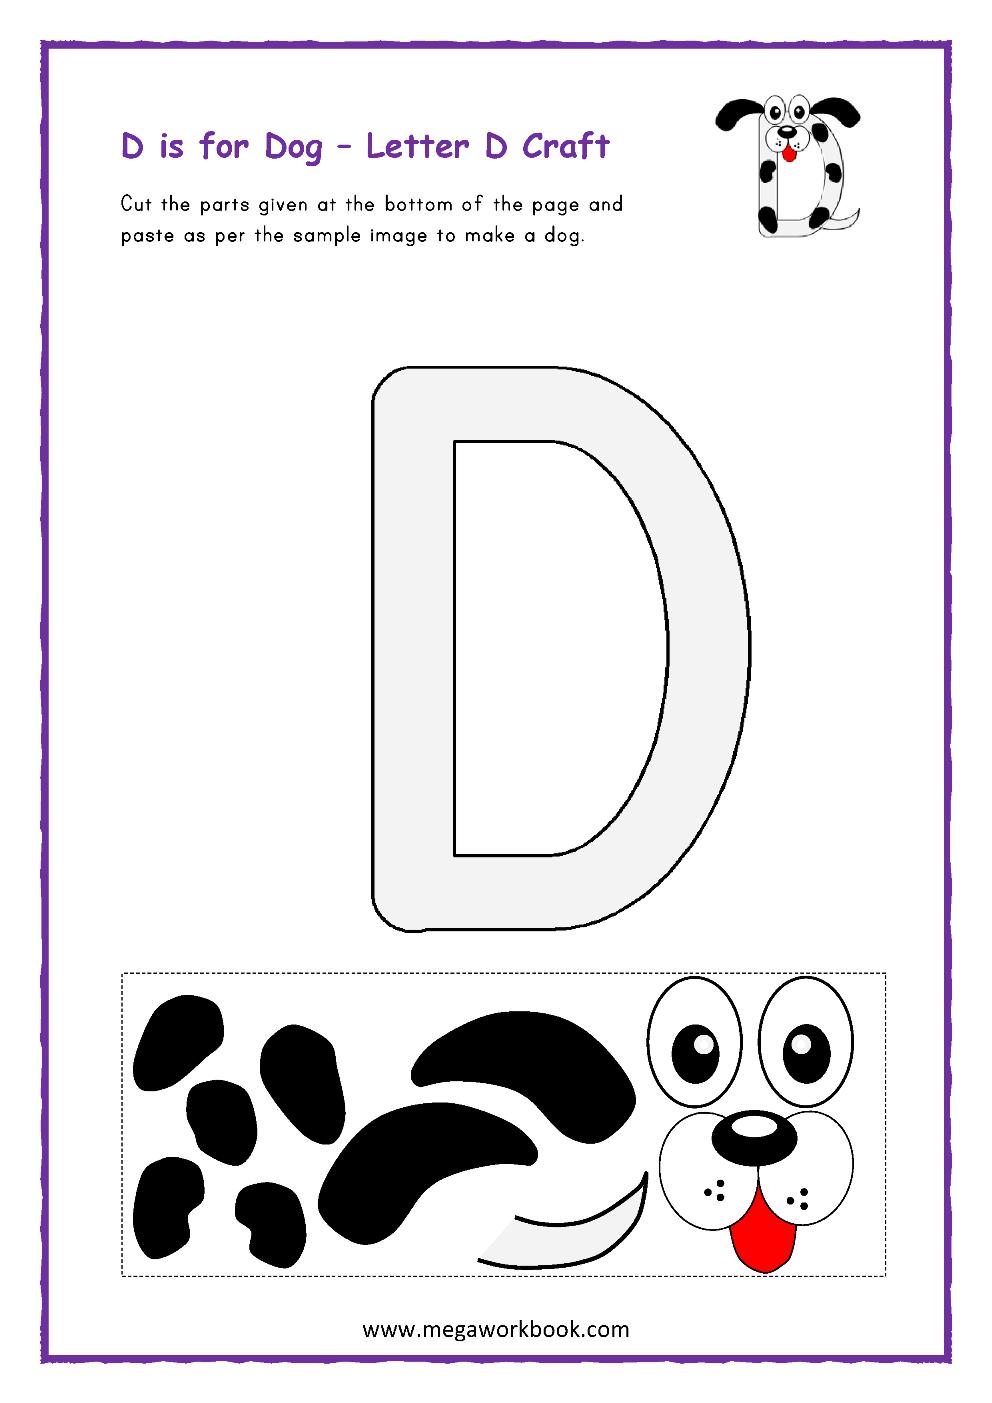 Letter D Activities Letter D Worksheets Letter D Activities For Preschoolers Letter D Printables Megaworkbook - 39+ Letter D Worksheets For Kindergarten Pictures